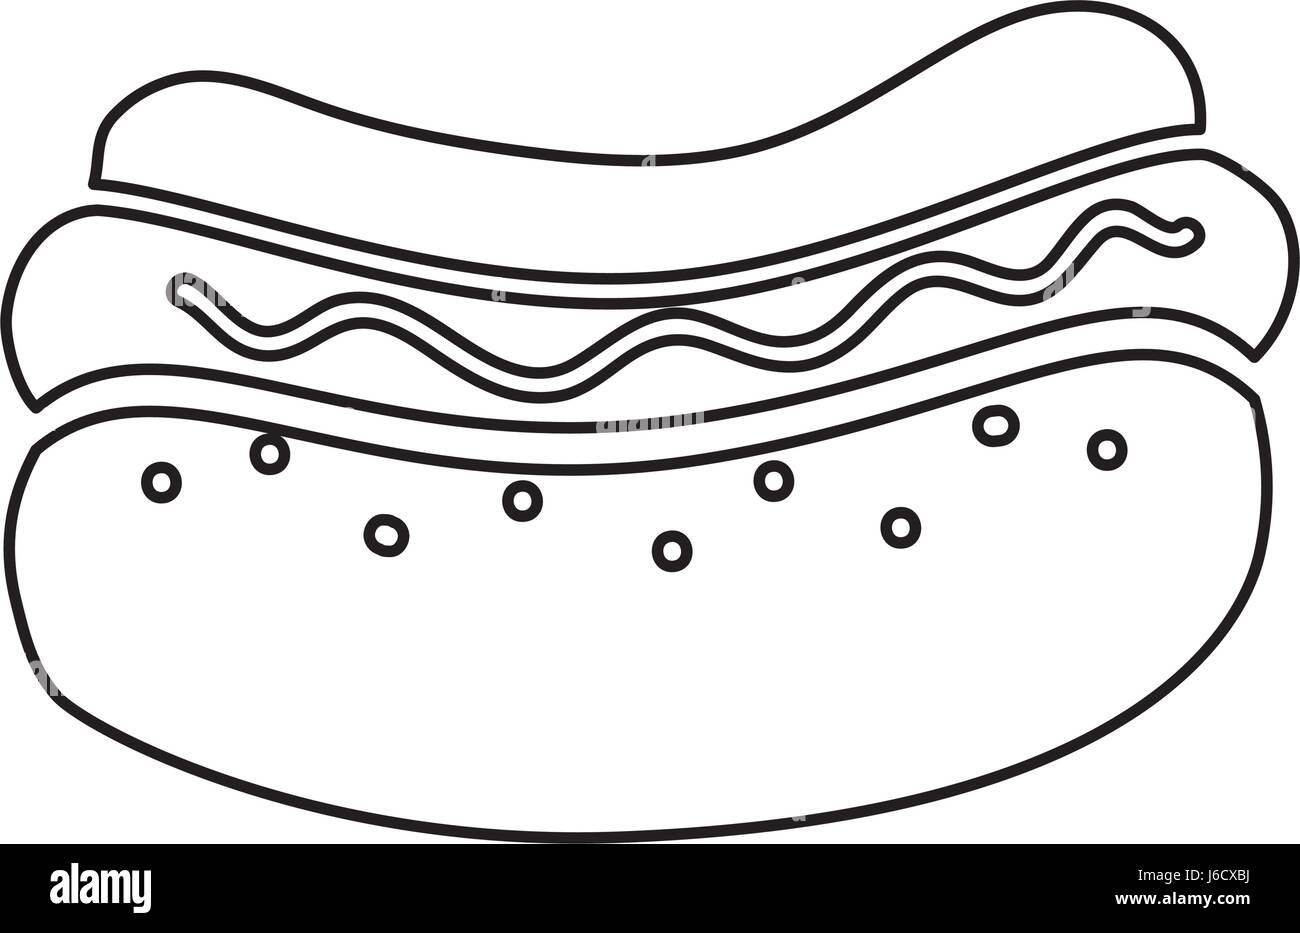 Hot dog fast food - Stock Image